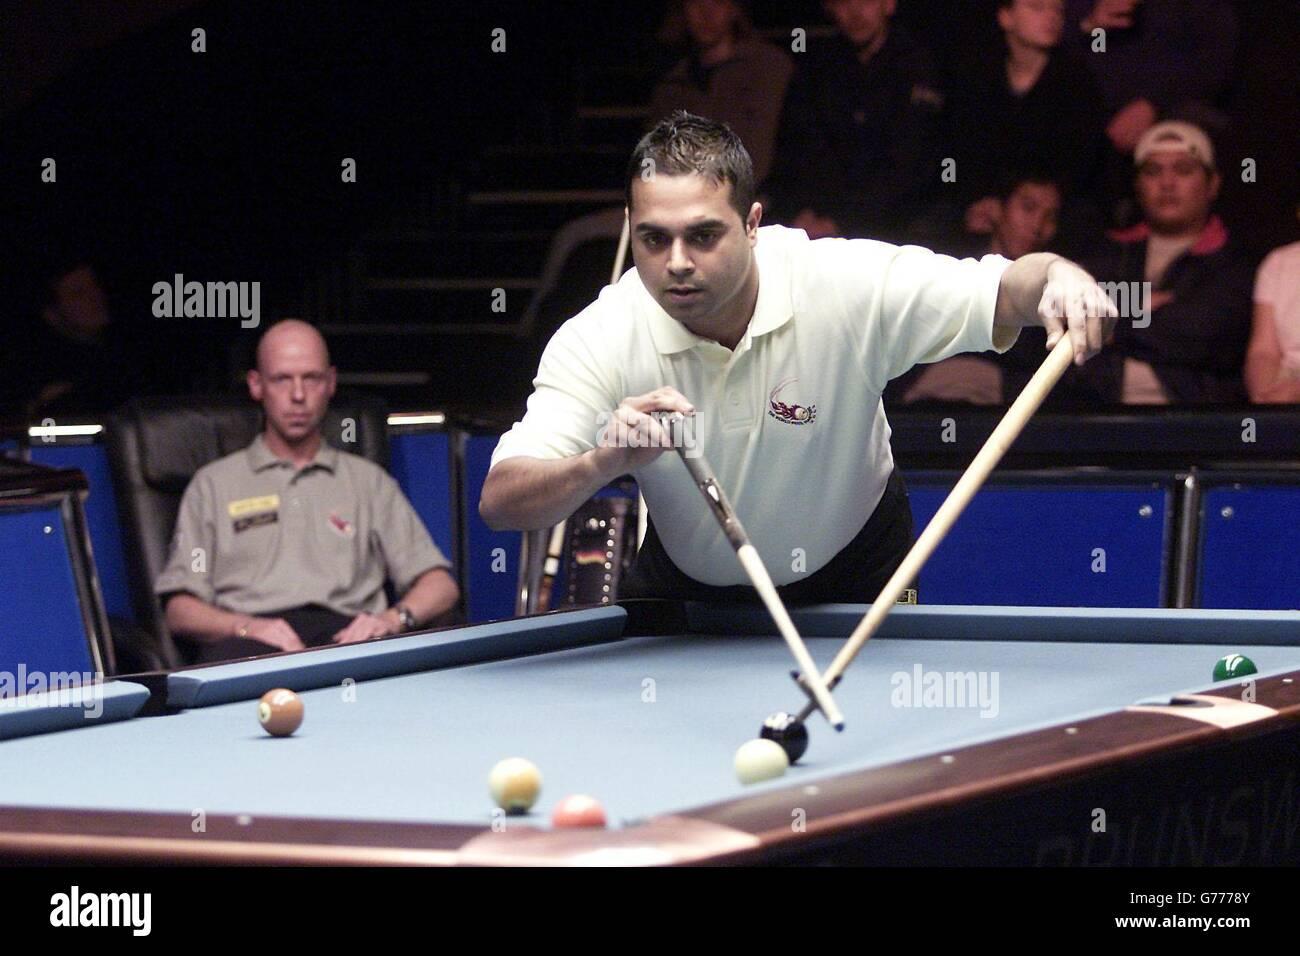 Majid - 2002 World Pool Masters tournament - Stock Image